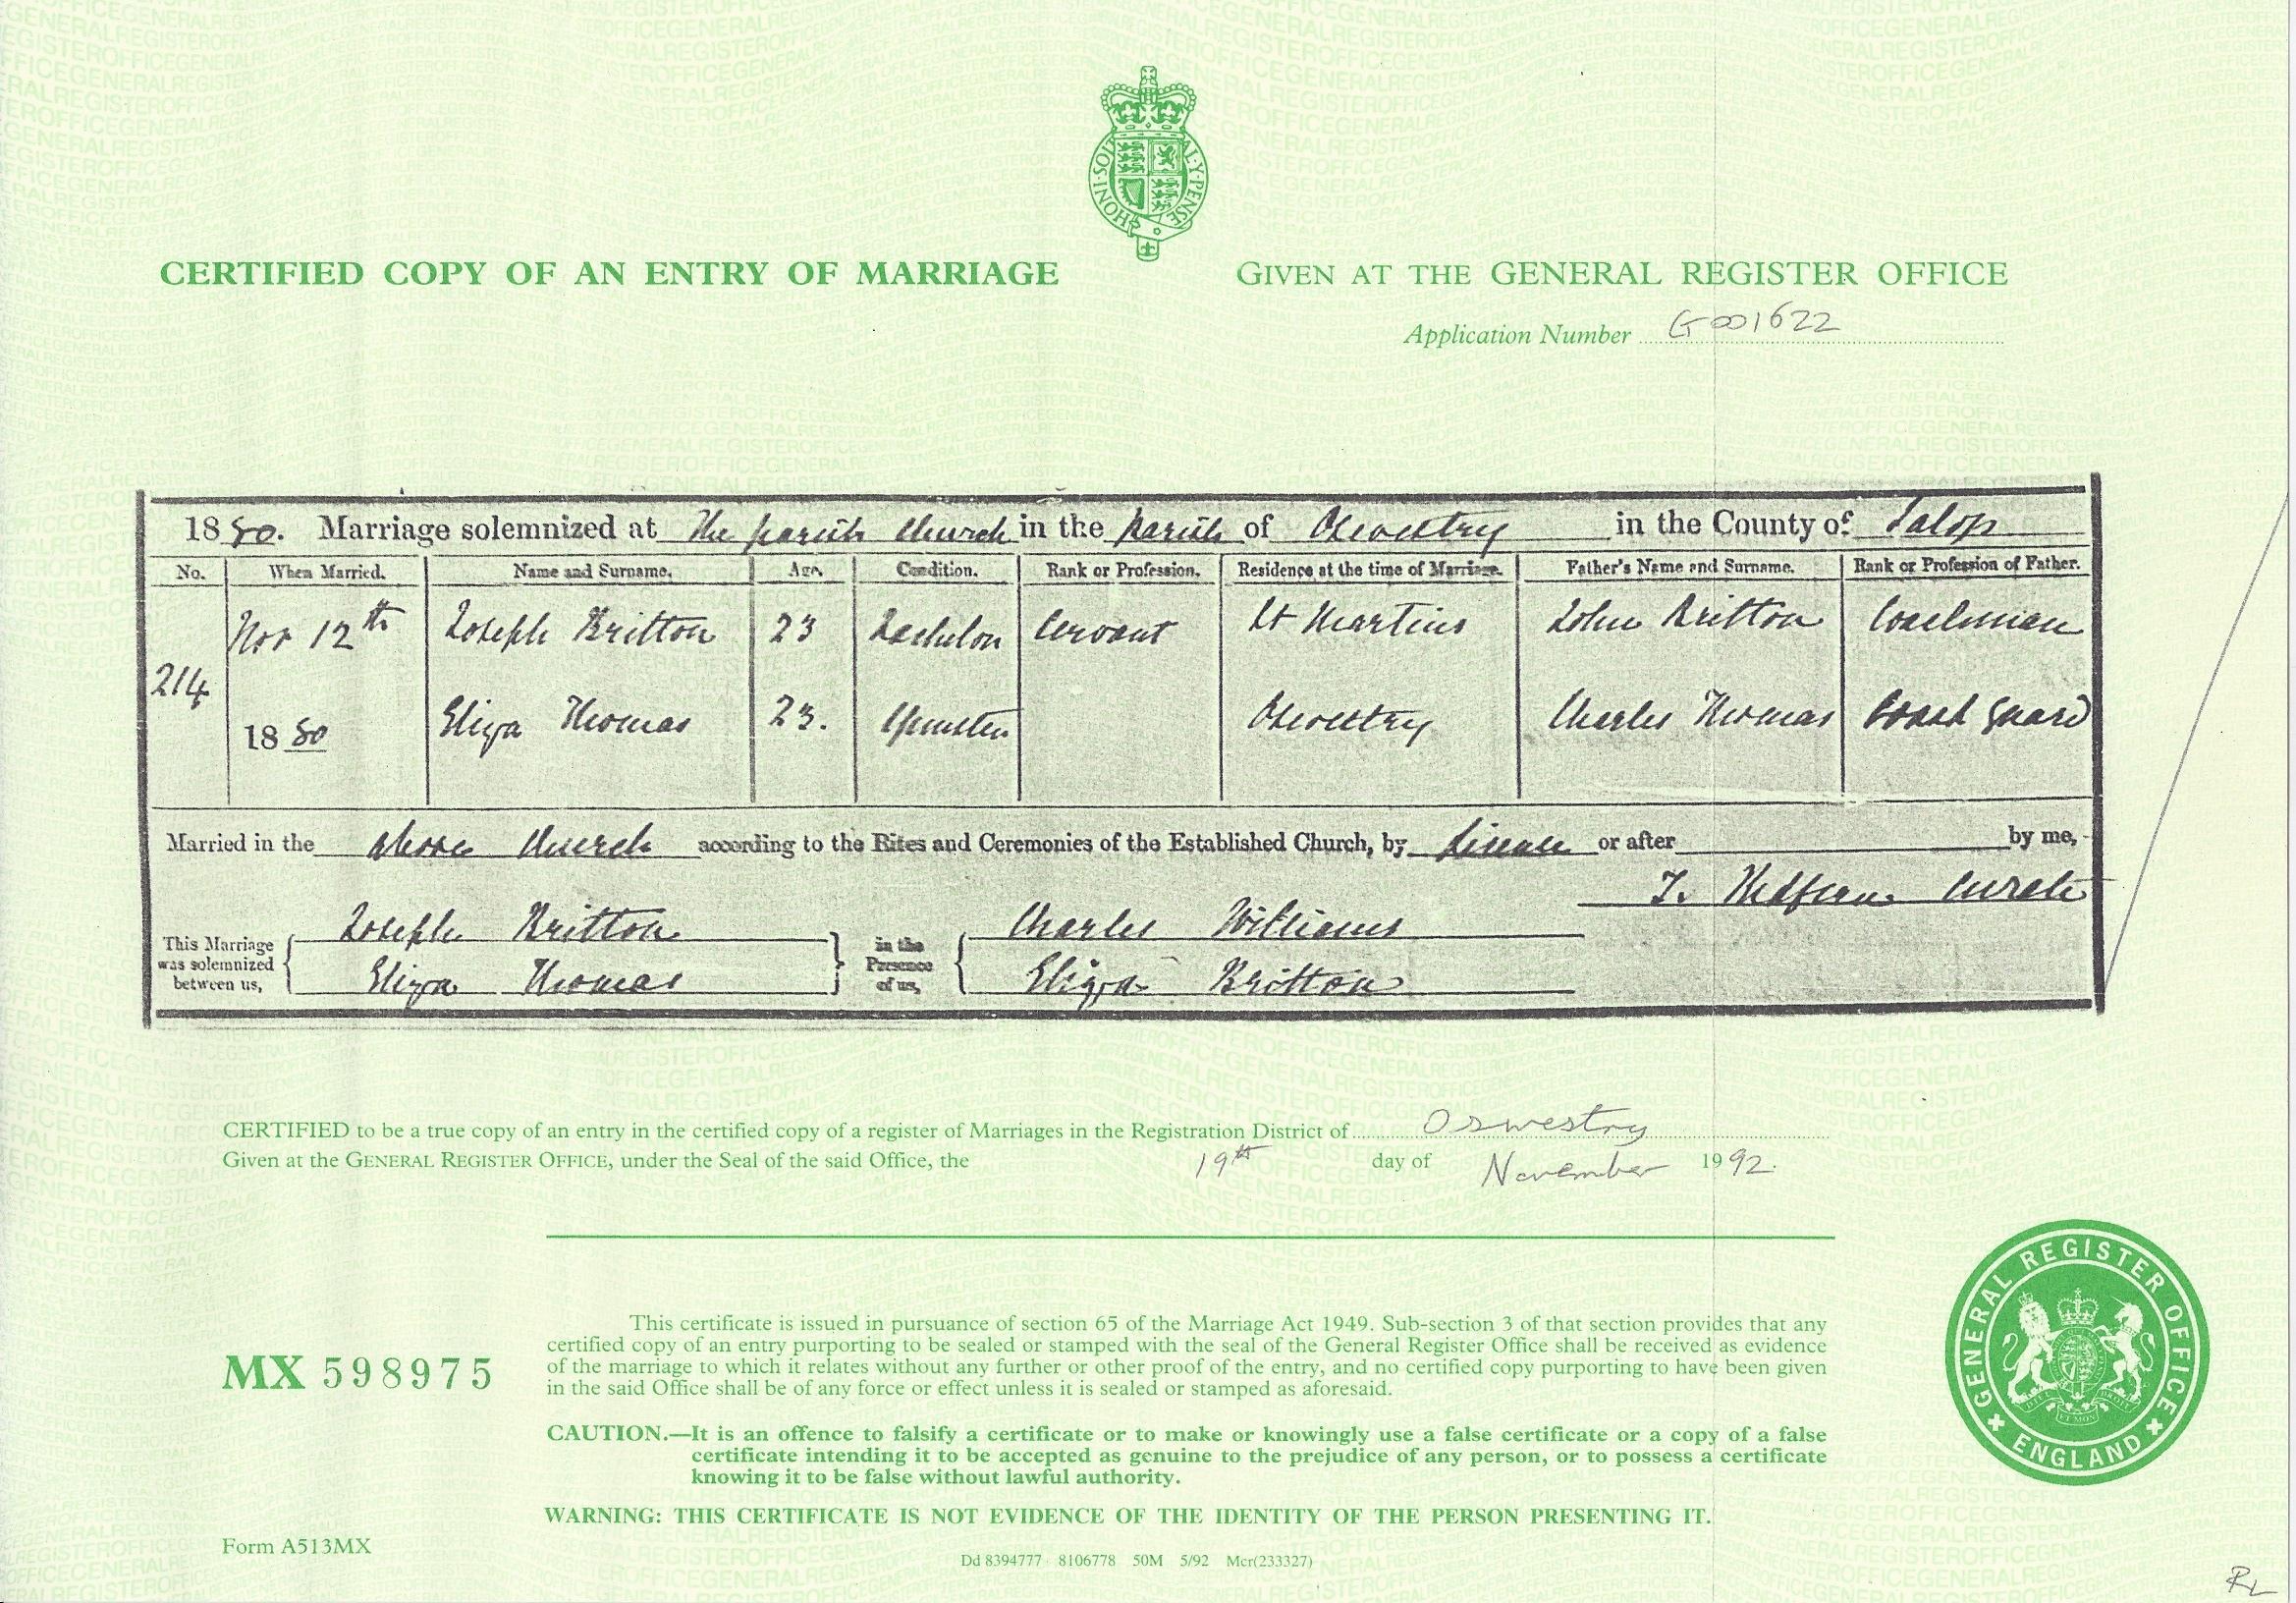 Marriage Certificate for Joseph Britton and Eliza Thomas